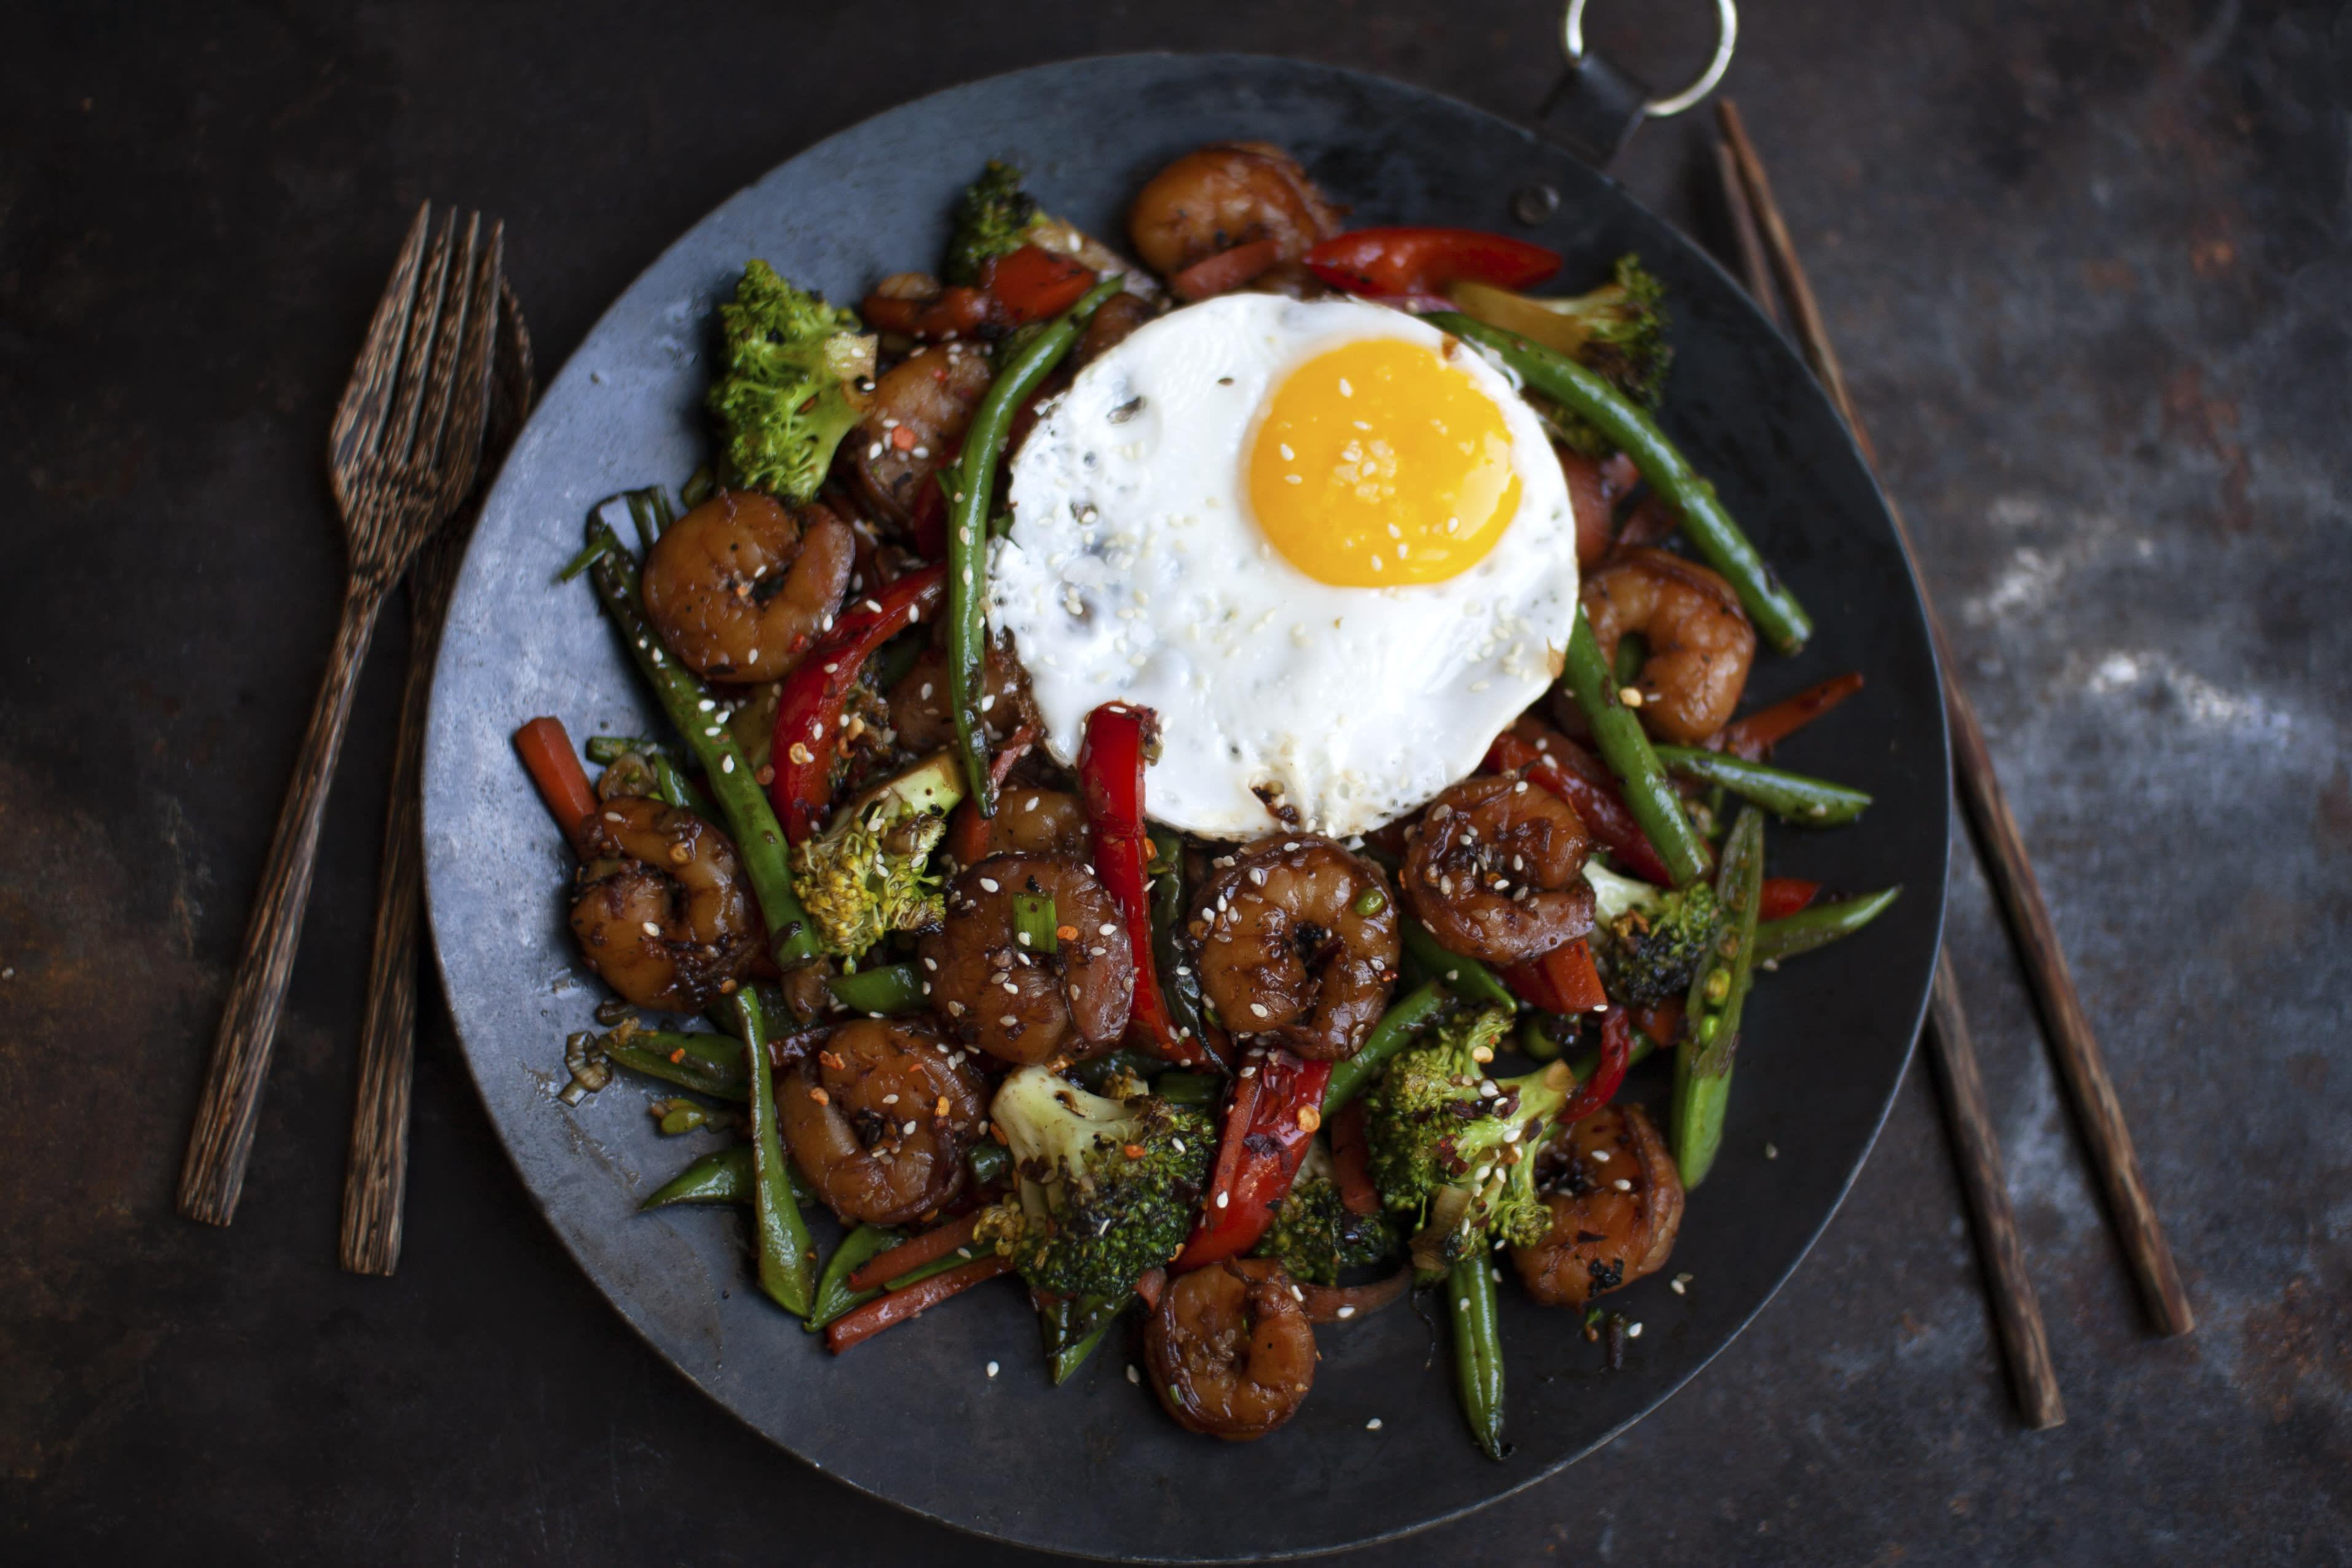 Korean Sesame Prawn Stir Fry with Eggs